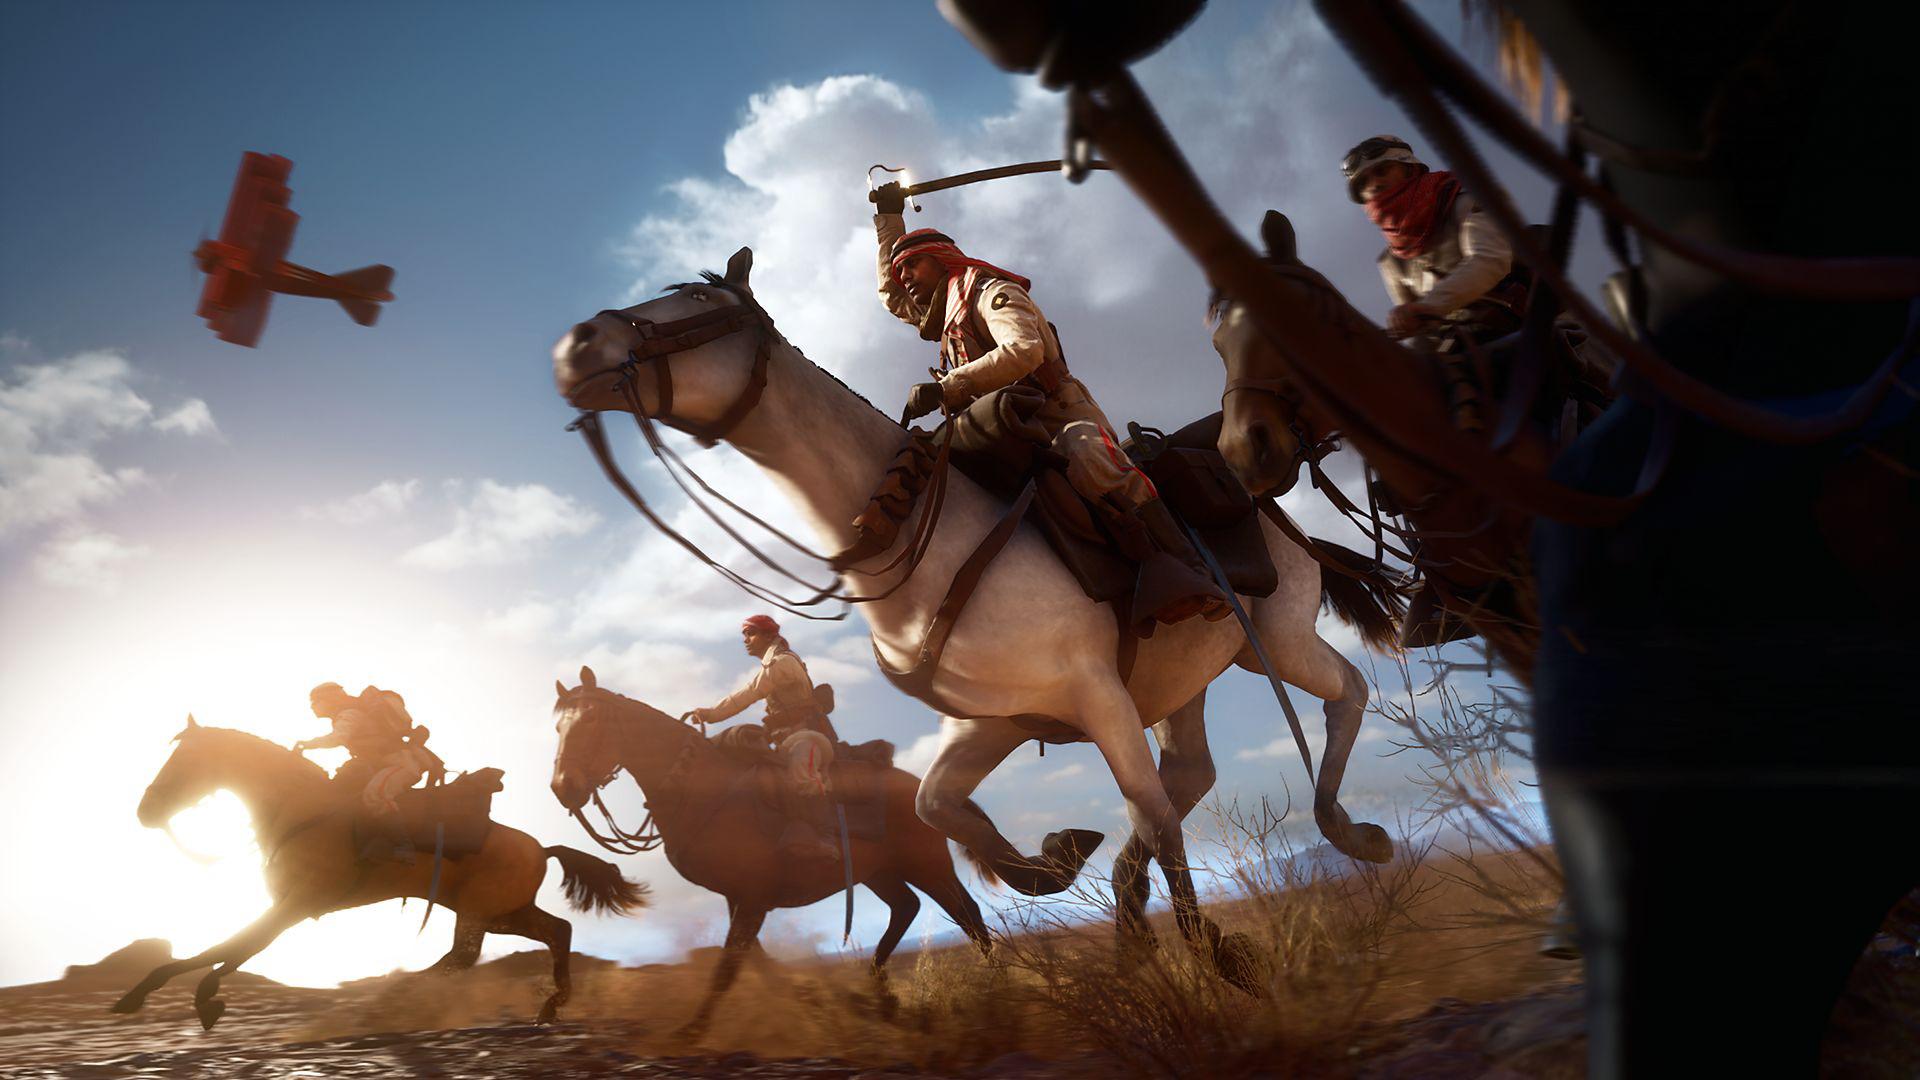 Steam喜加一:收费支付《战地1》步兵绑缚包